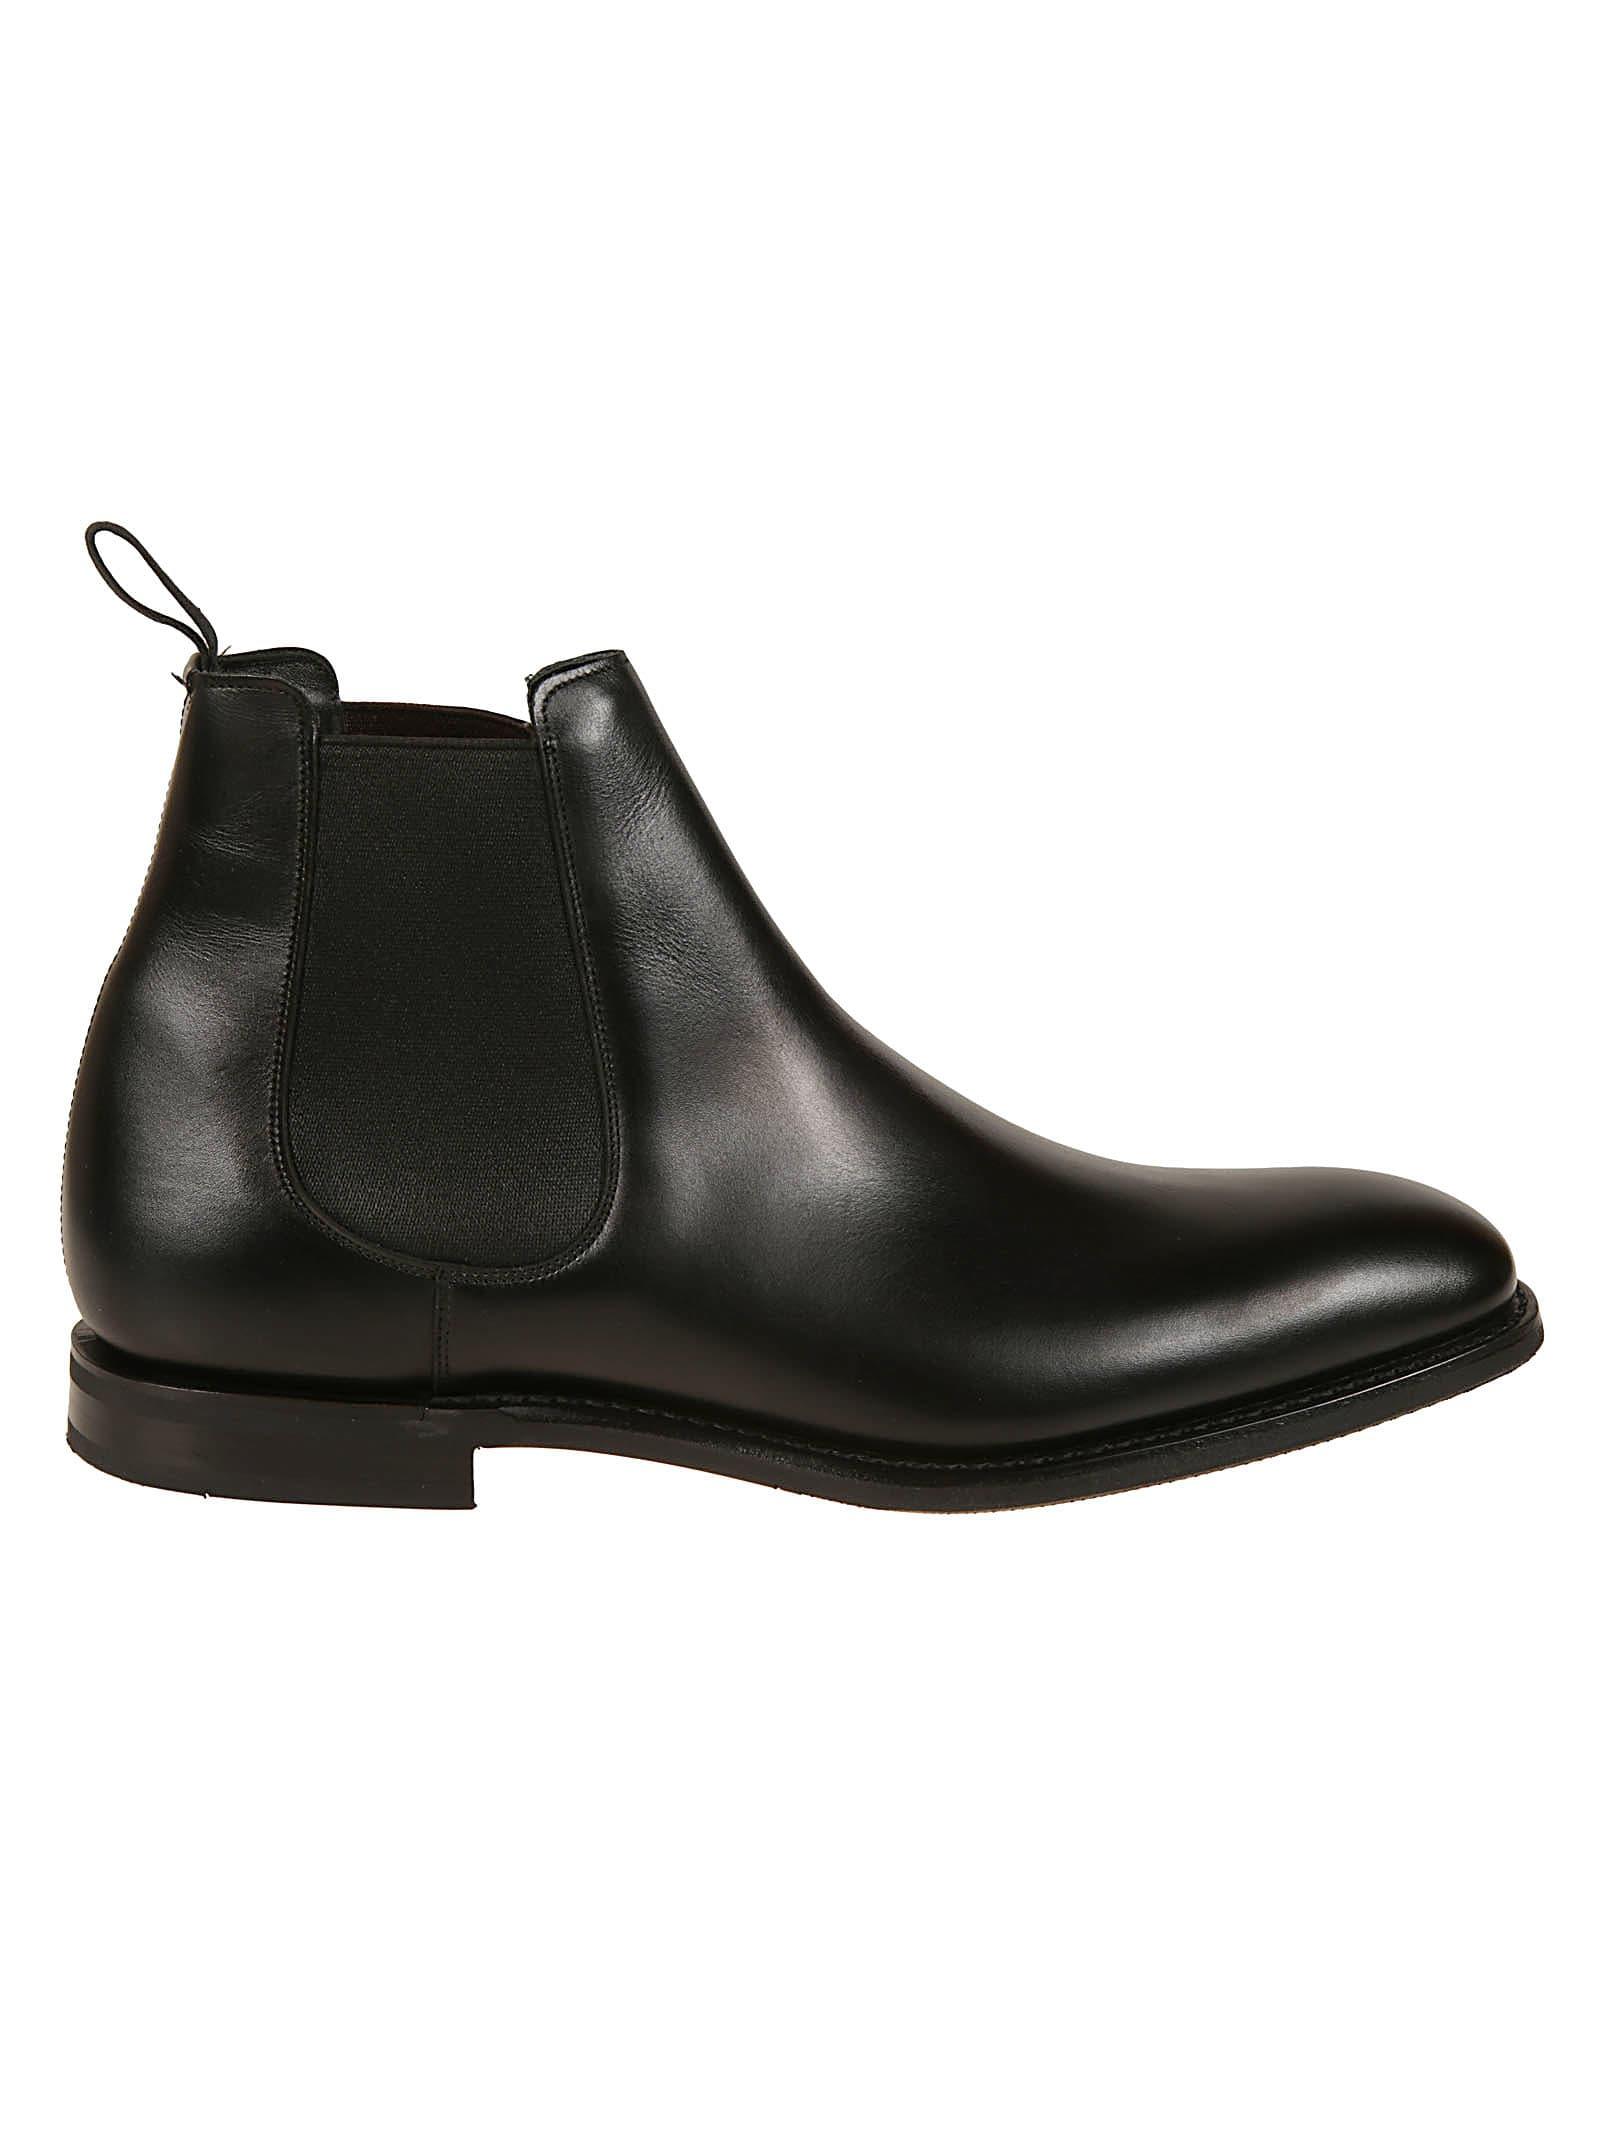 Churchs Prenton Ankle Boots